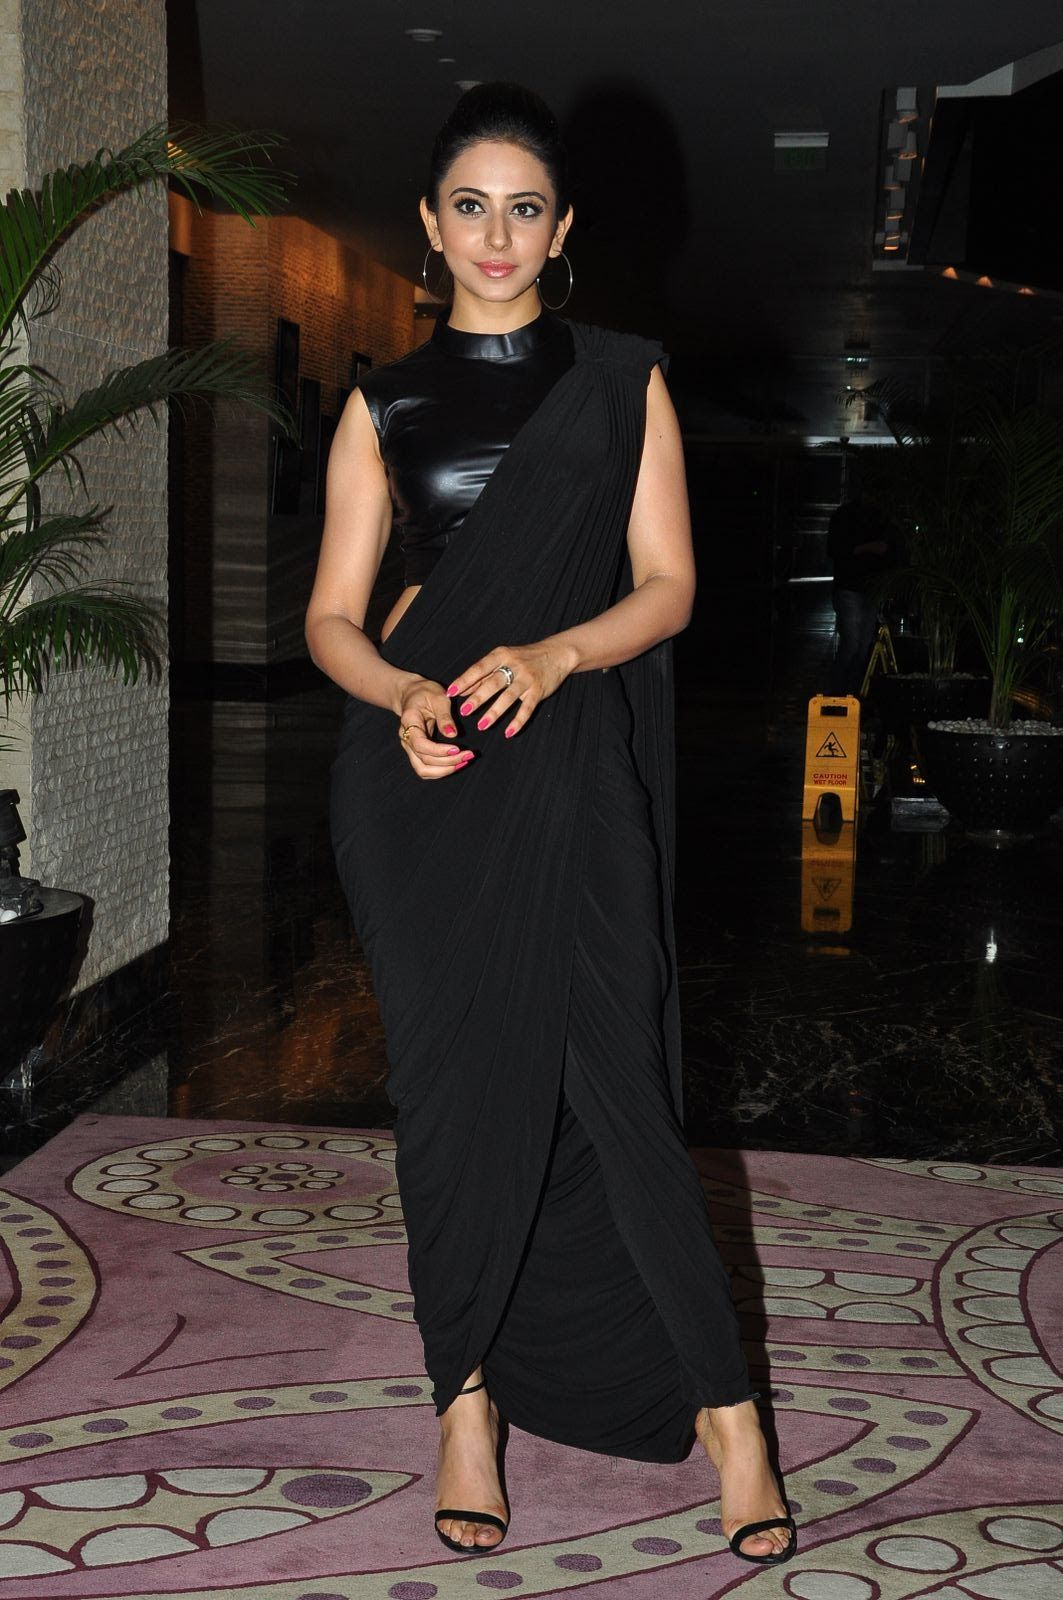 Beautiful Telugu Girl Rakul Preet Singh Face Close Up Stills - Tollywood Boost in 2021 | Black saree, Black dress, Hot black dress